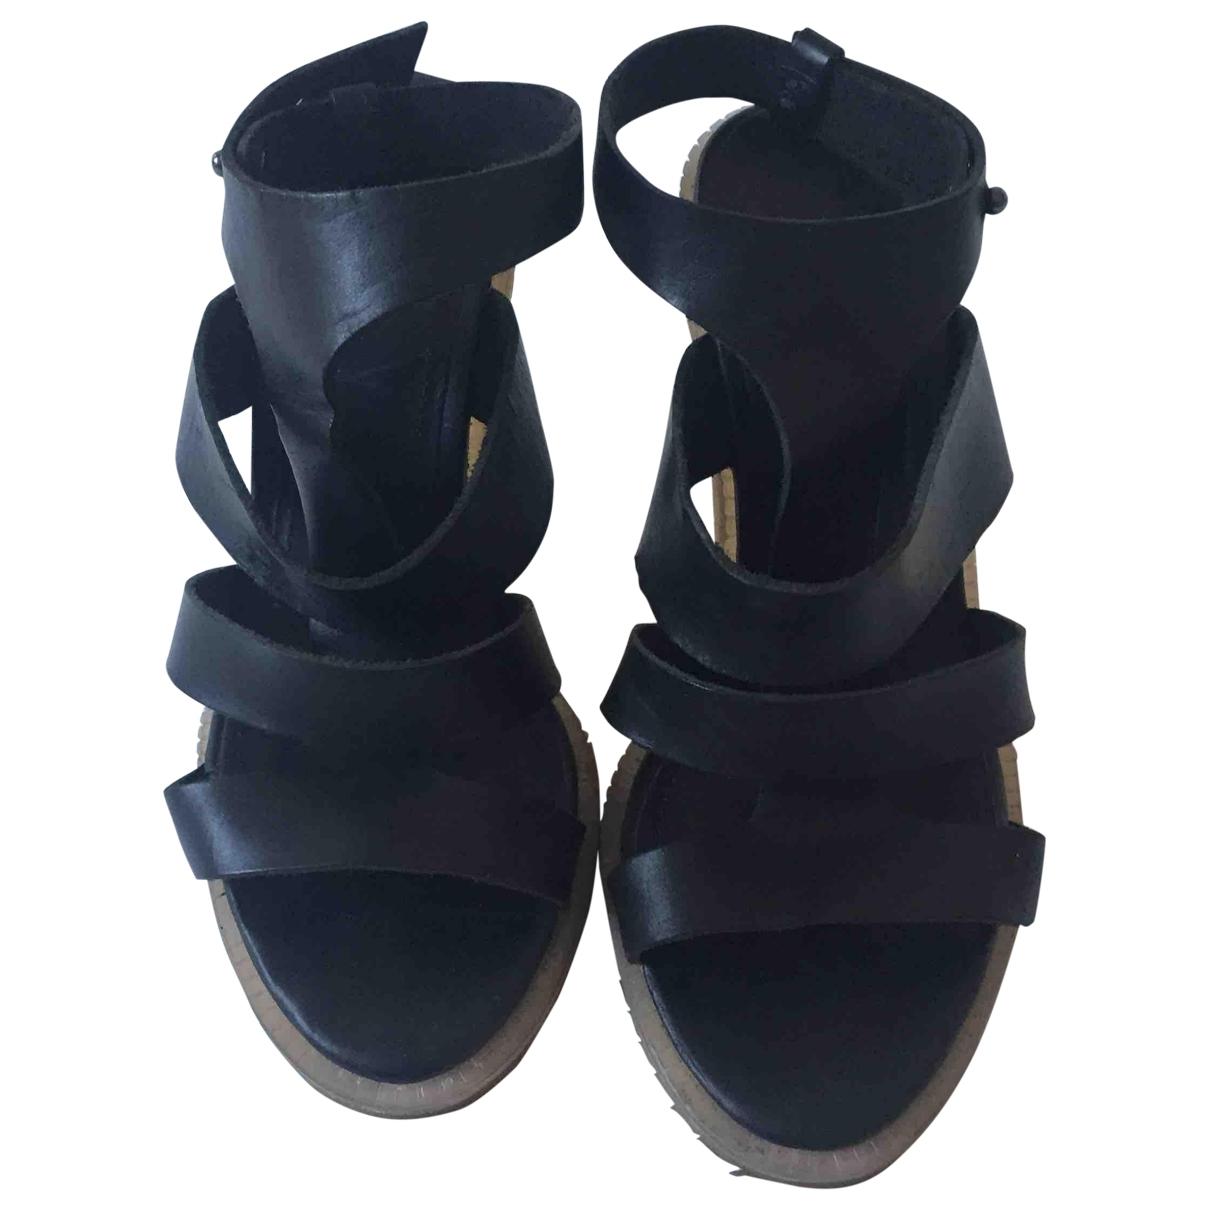 & Stories \N Black Leather Heels for Women 38.5 EU